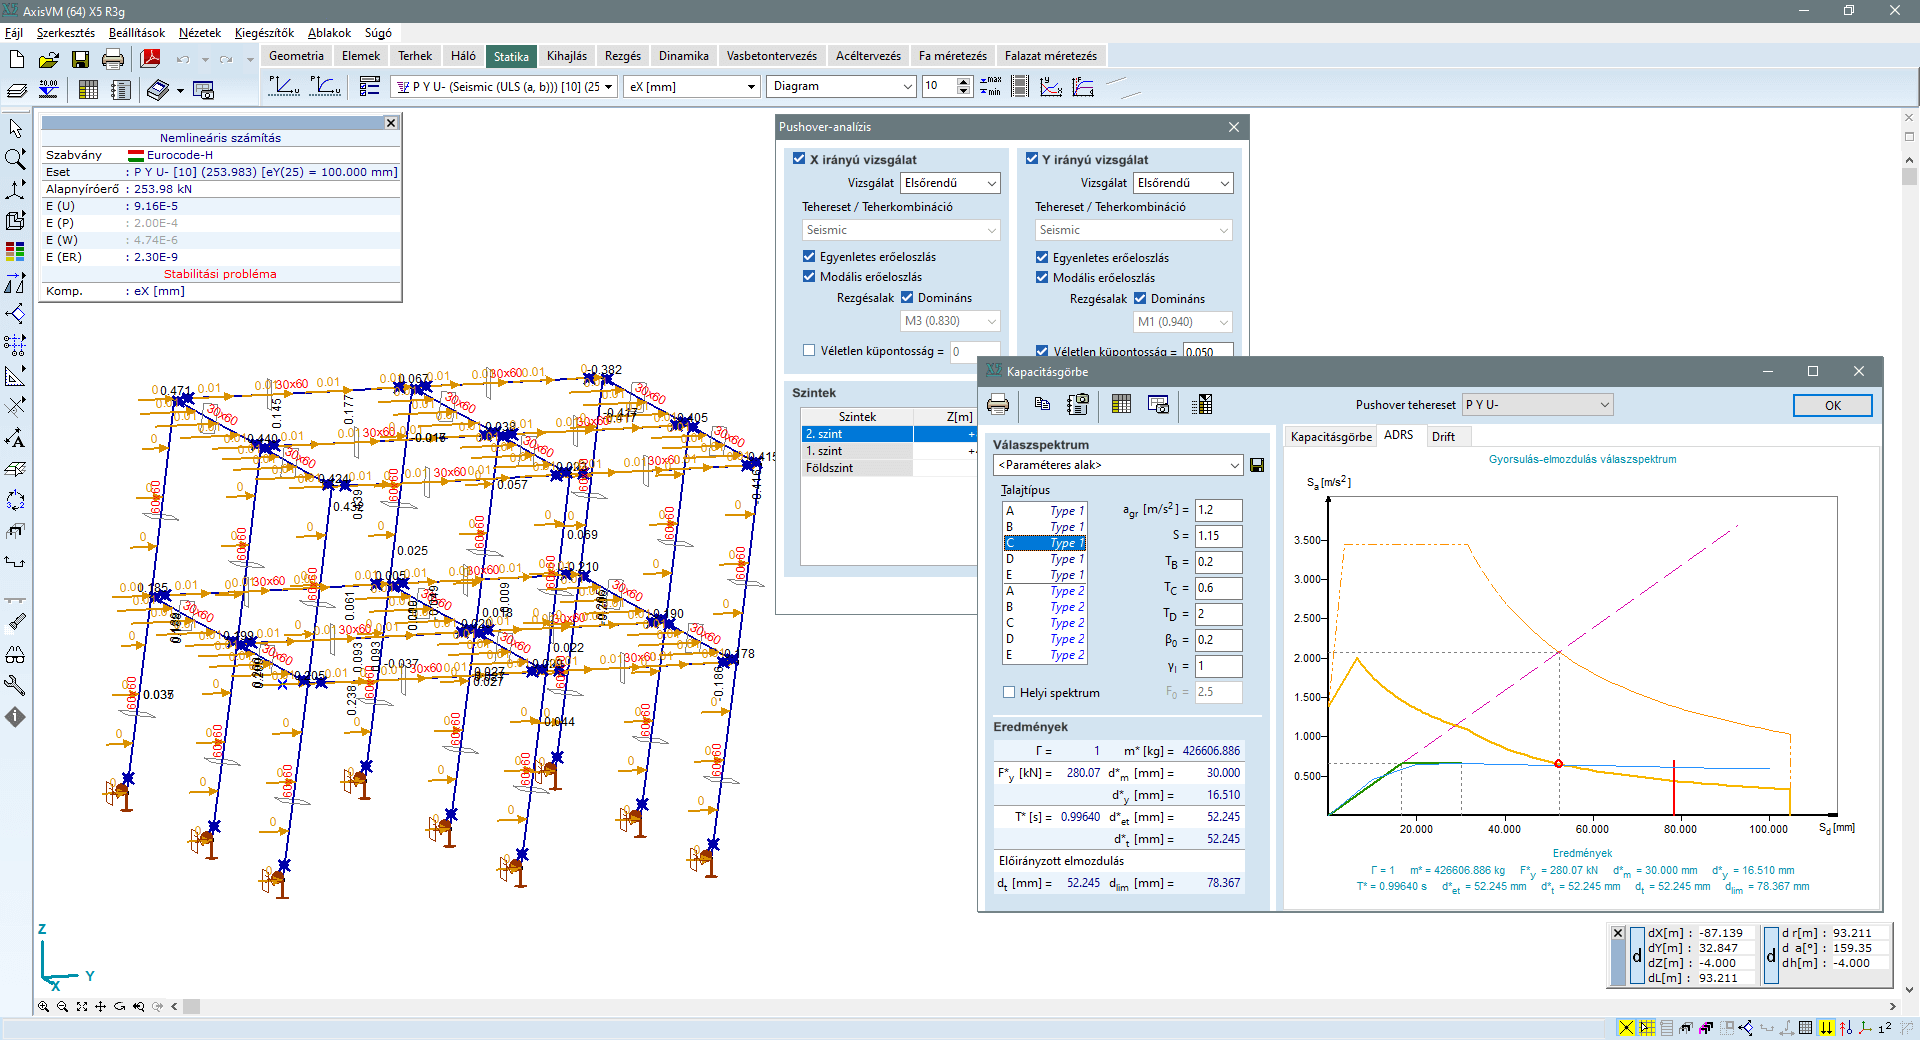 SE2 - adrs spektrum